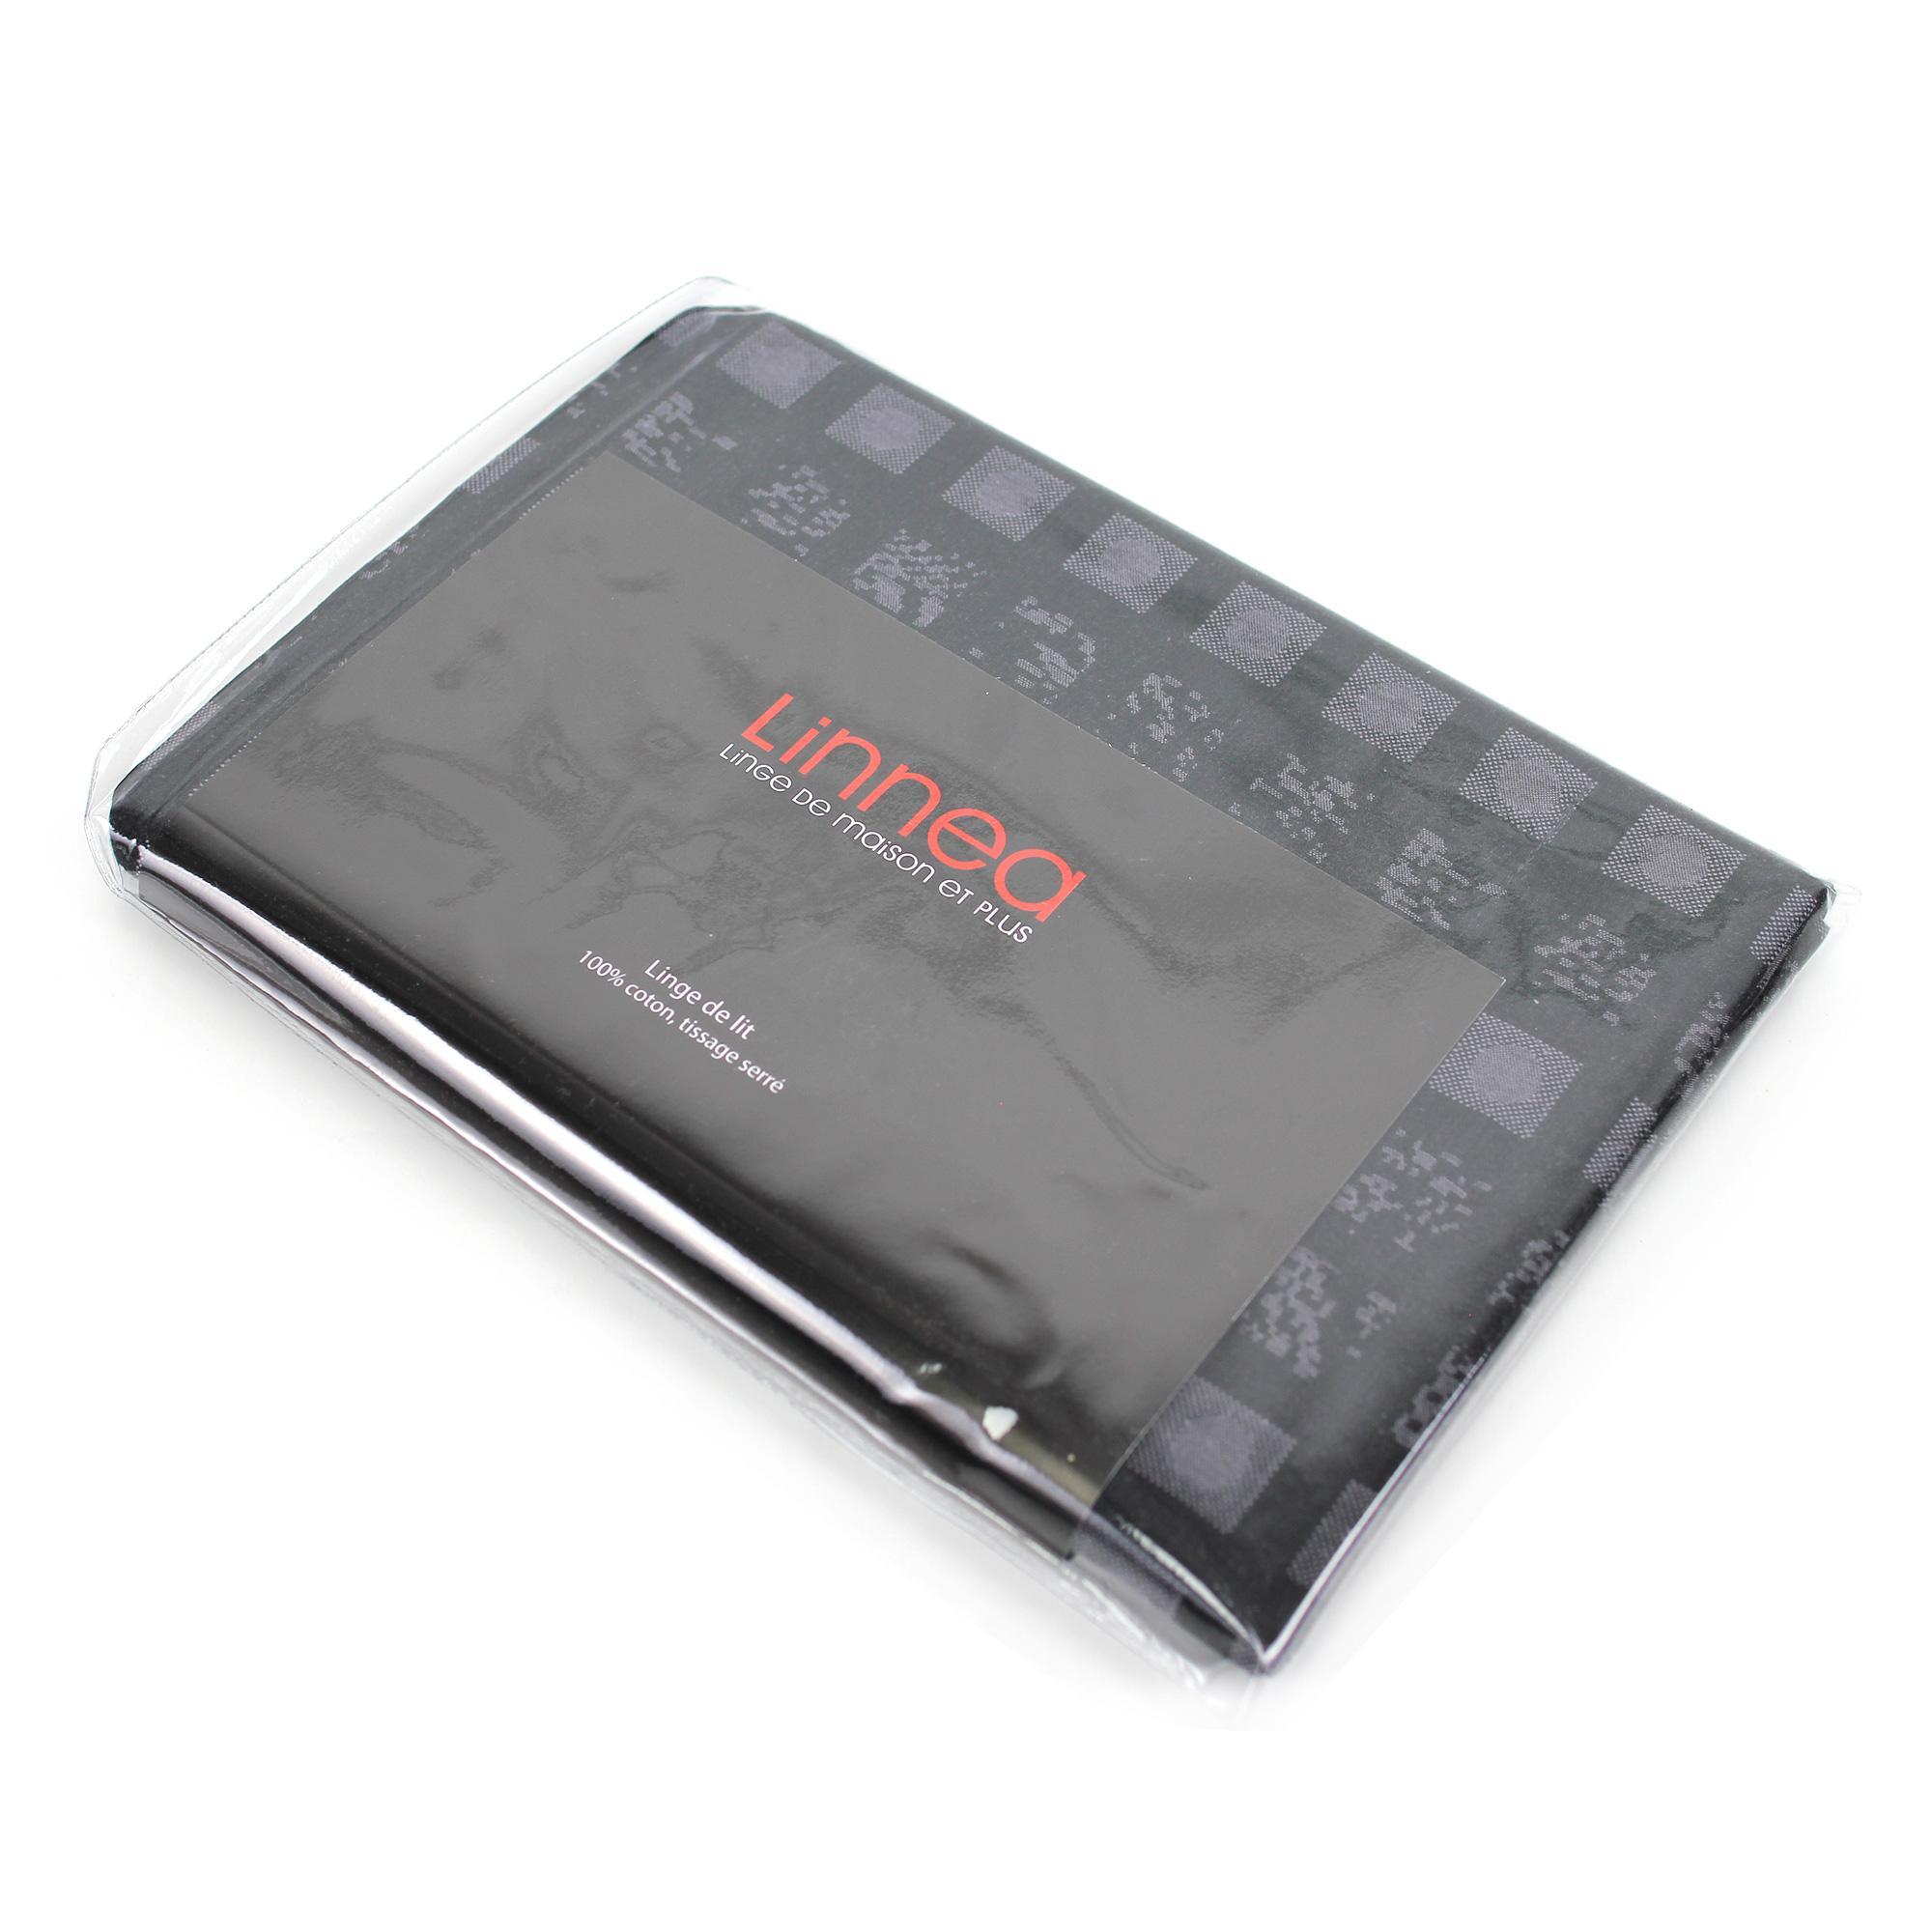 taie d 39 oreiller 65x65 satin de coton trocadero gris anthracite ebay. Black Bedroom Furniture Sets. Home Design Ideas